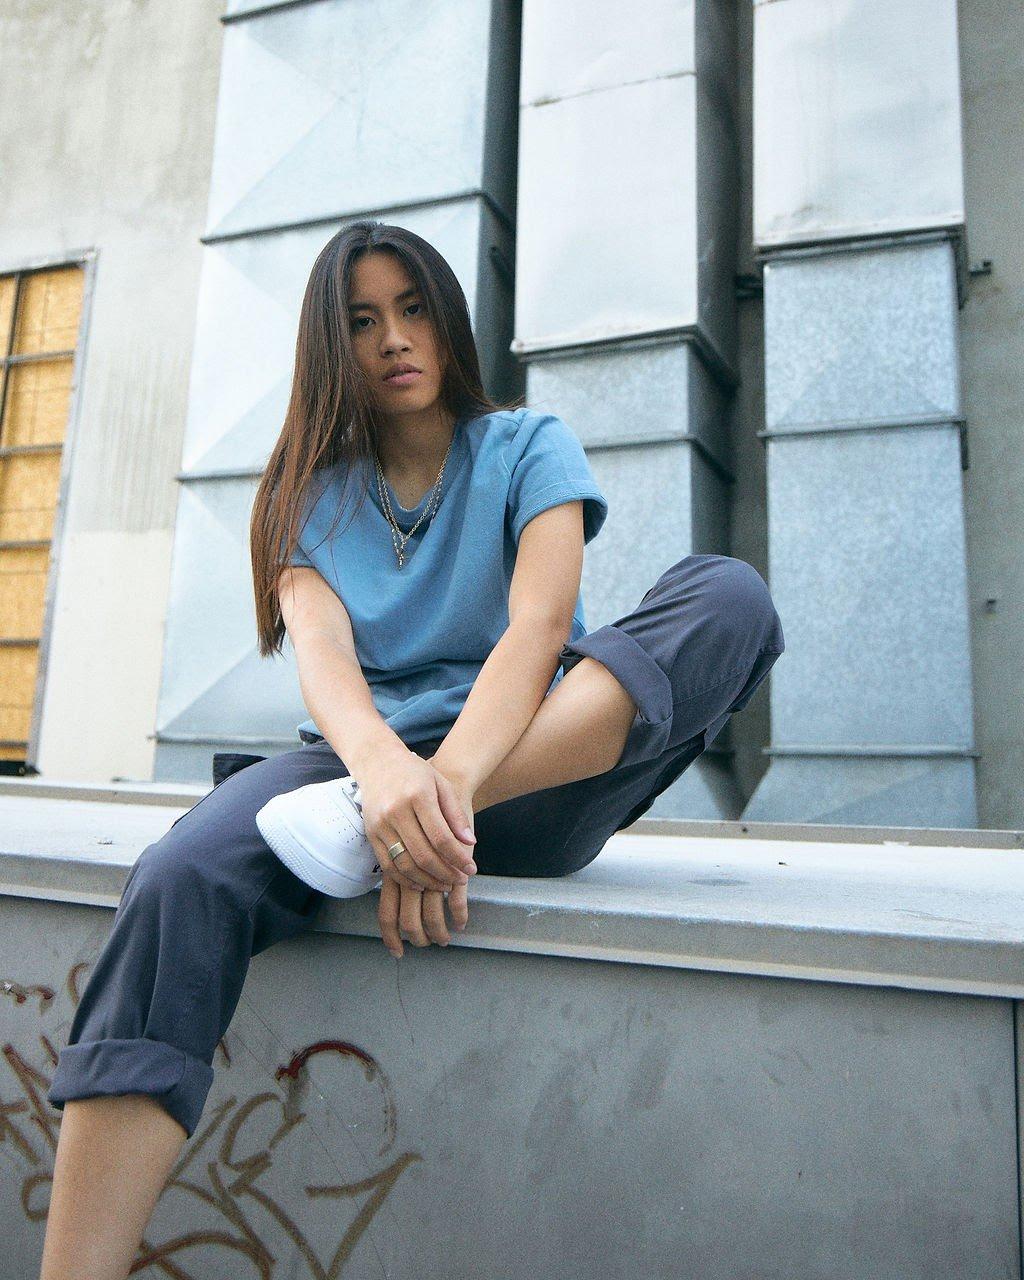 Emily Vu sits on a ledge in an urban environment.